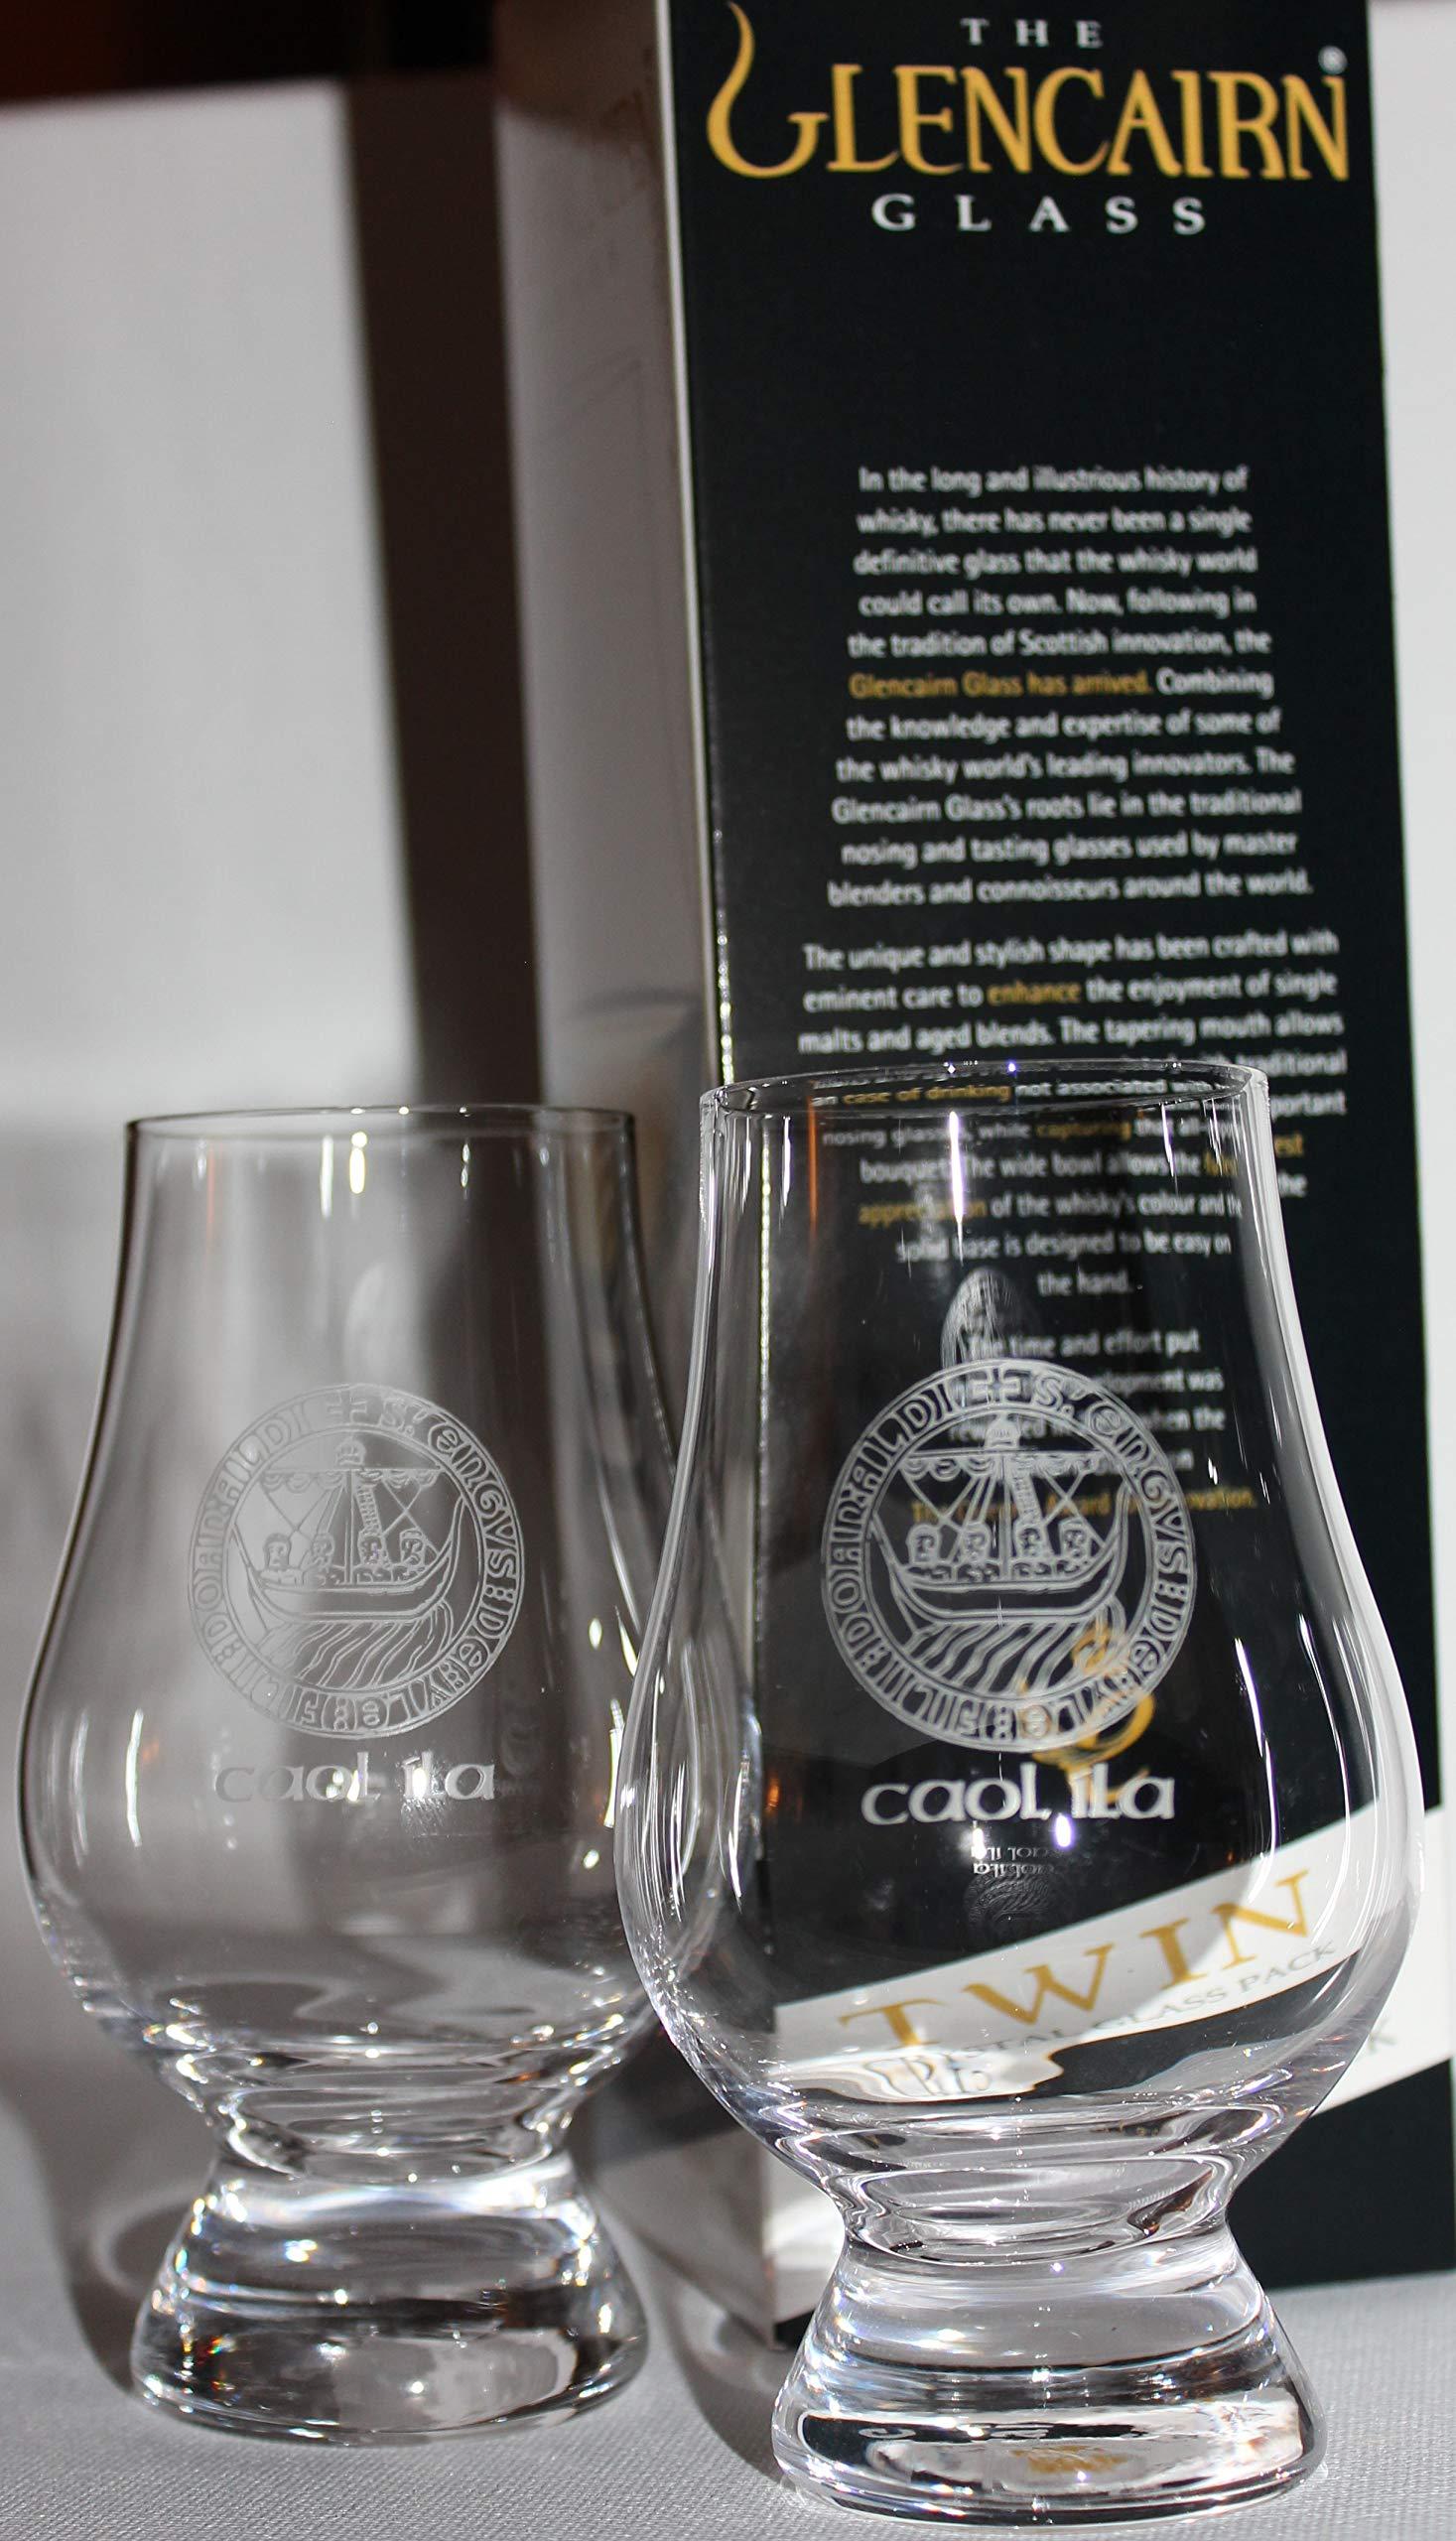 Caol Ila Islay Crest Twin Pack Glencairn Whisky Tasting Glasses